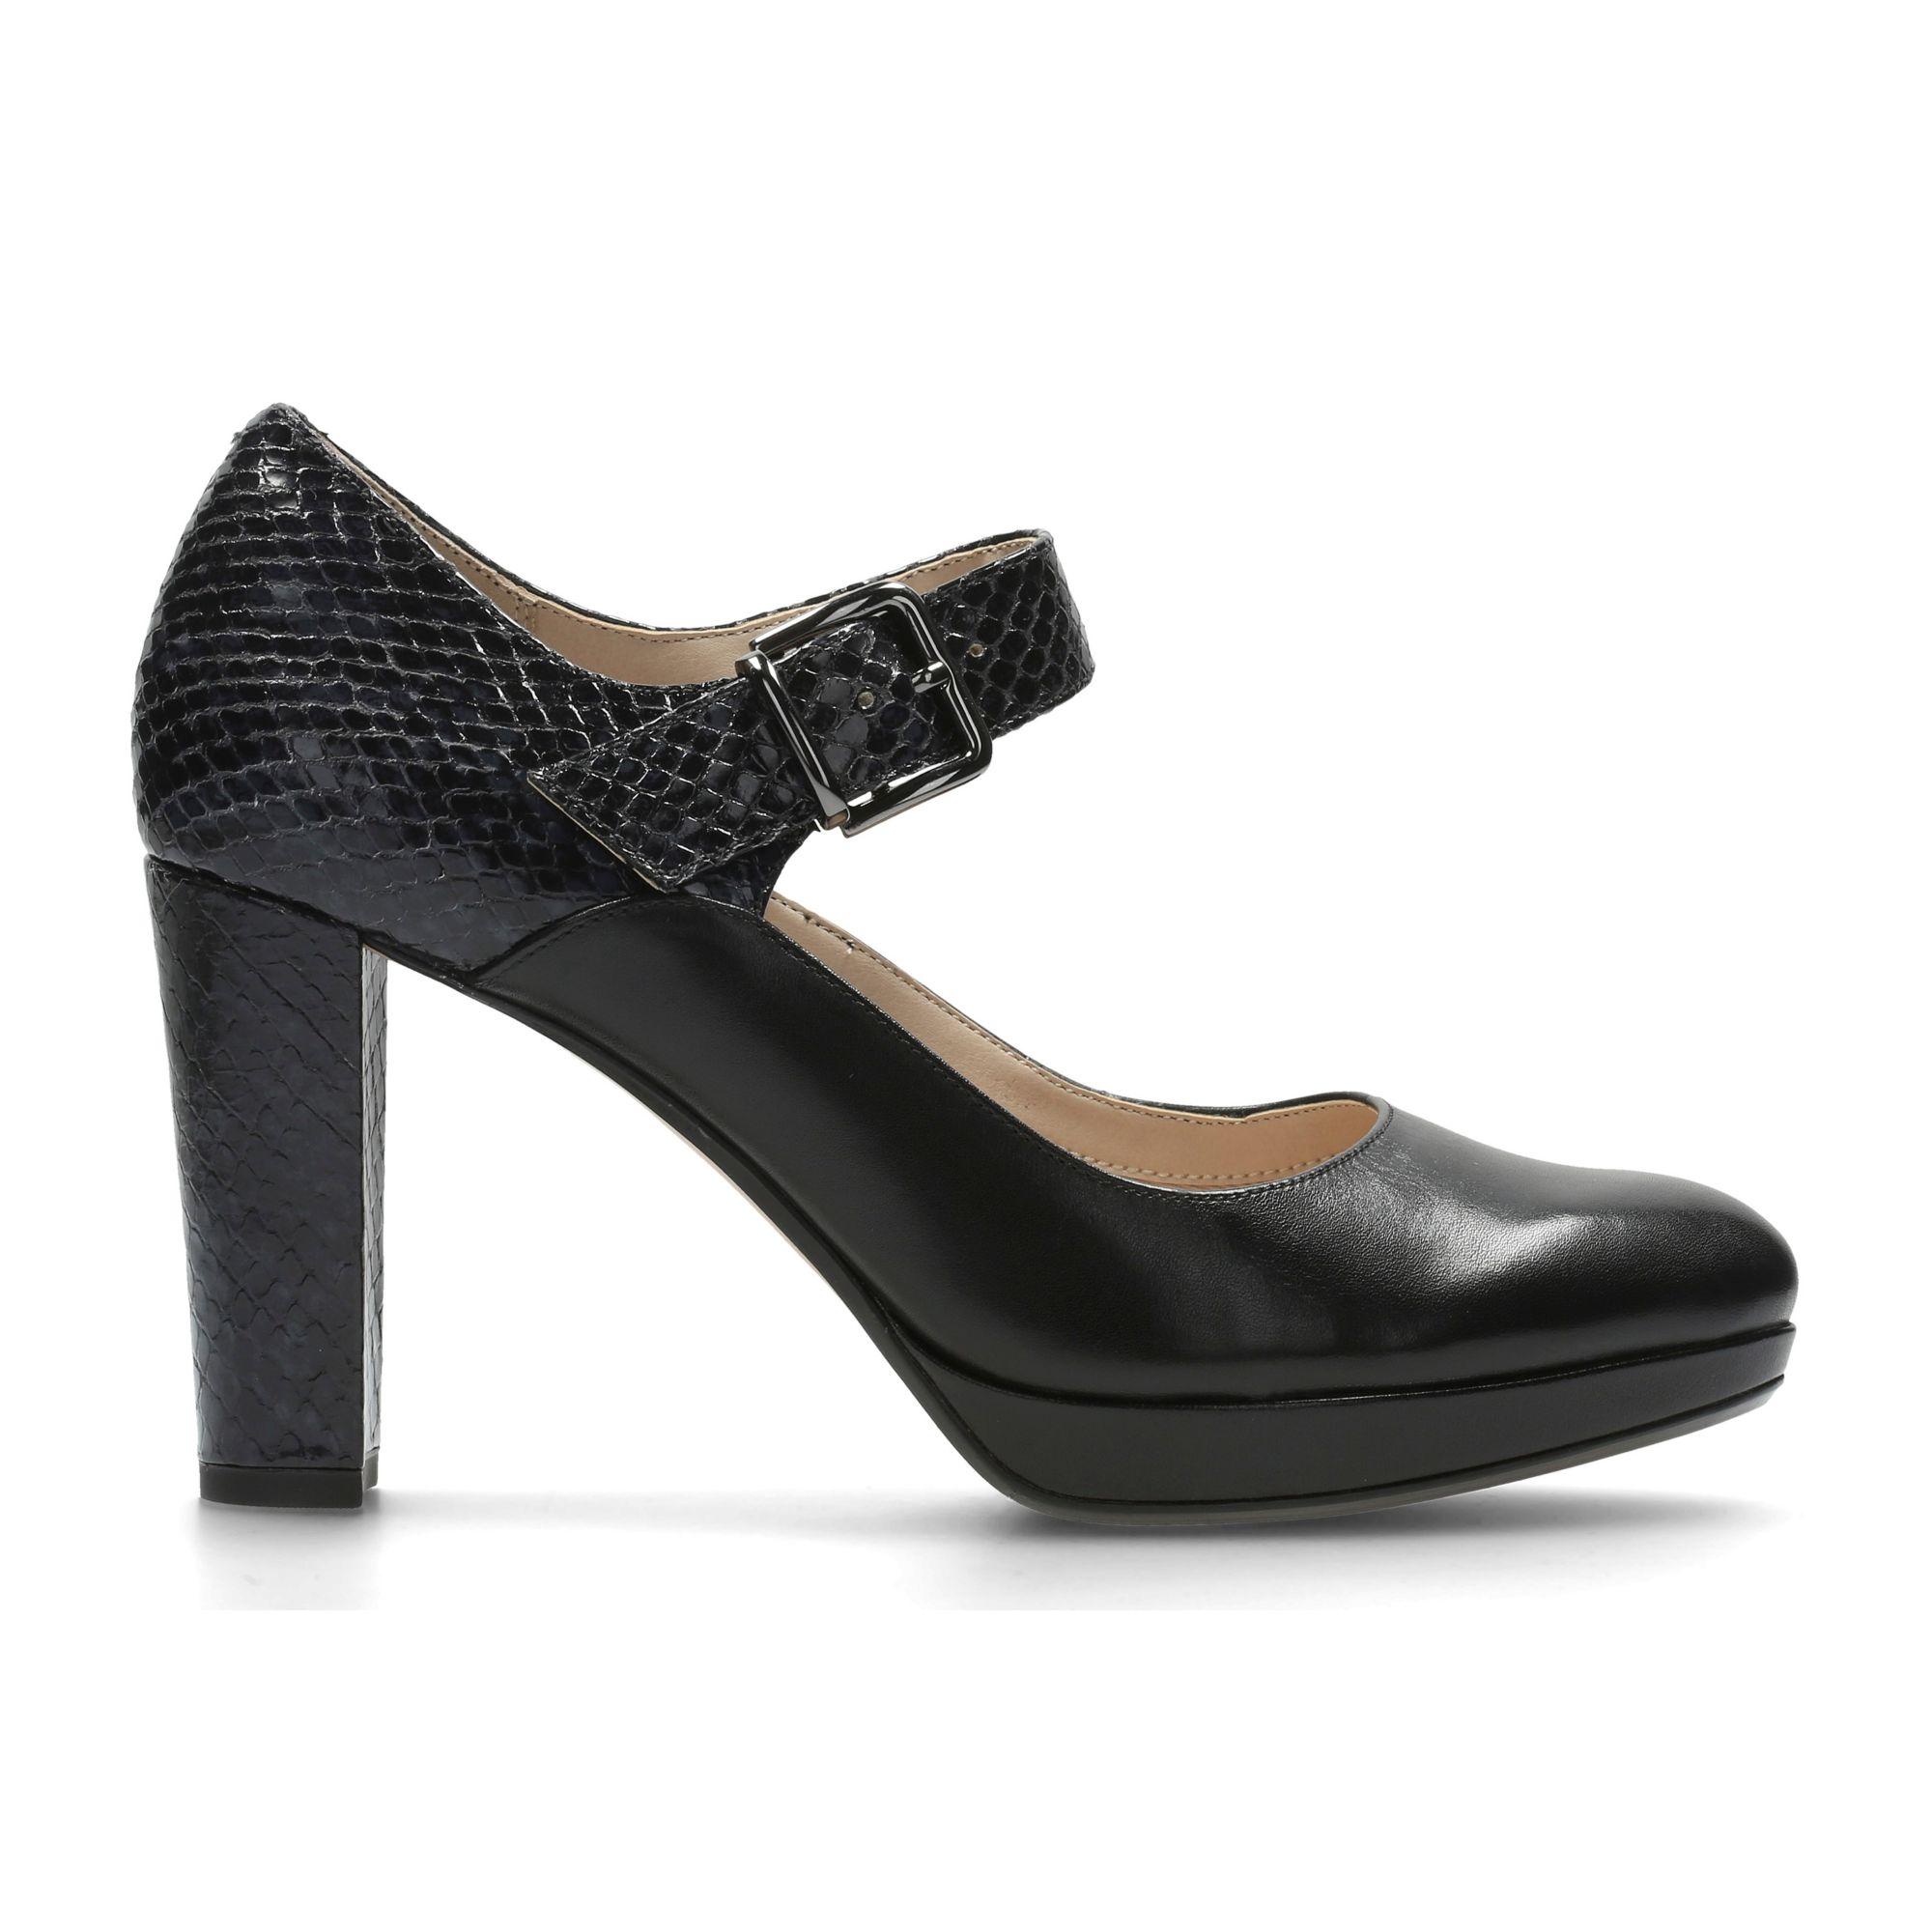 Zapatos mujer Kendra Gaby: Tiendas Notizalia